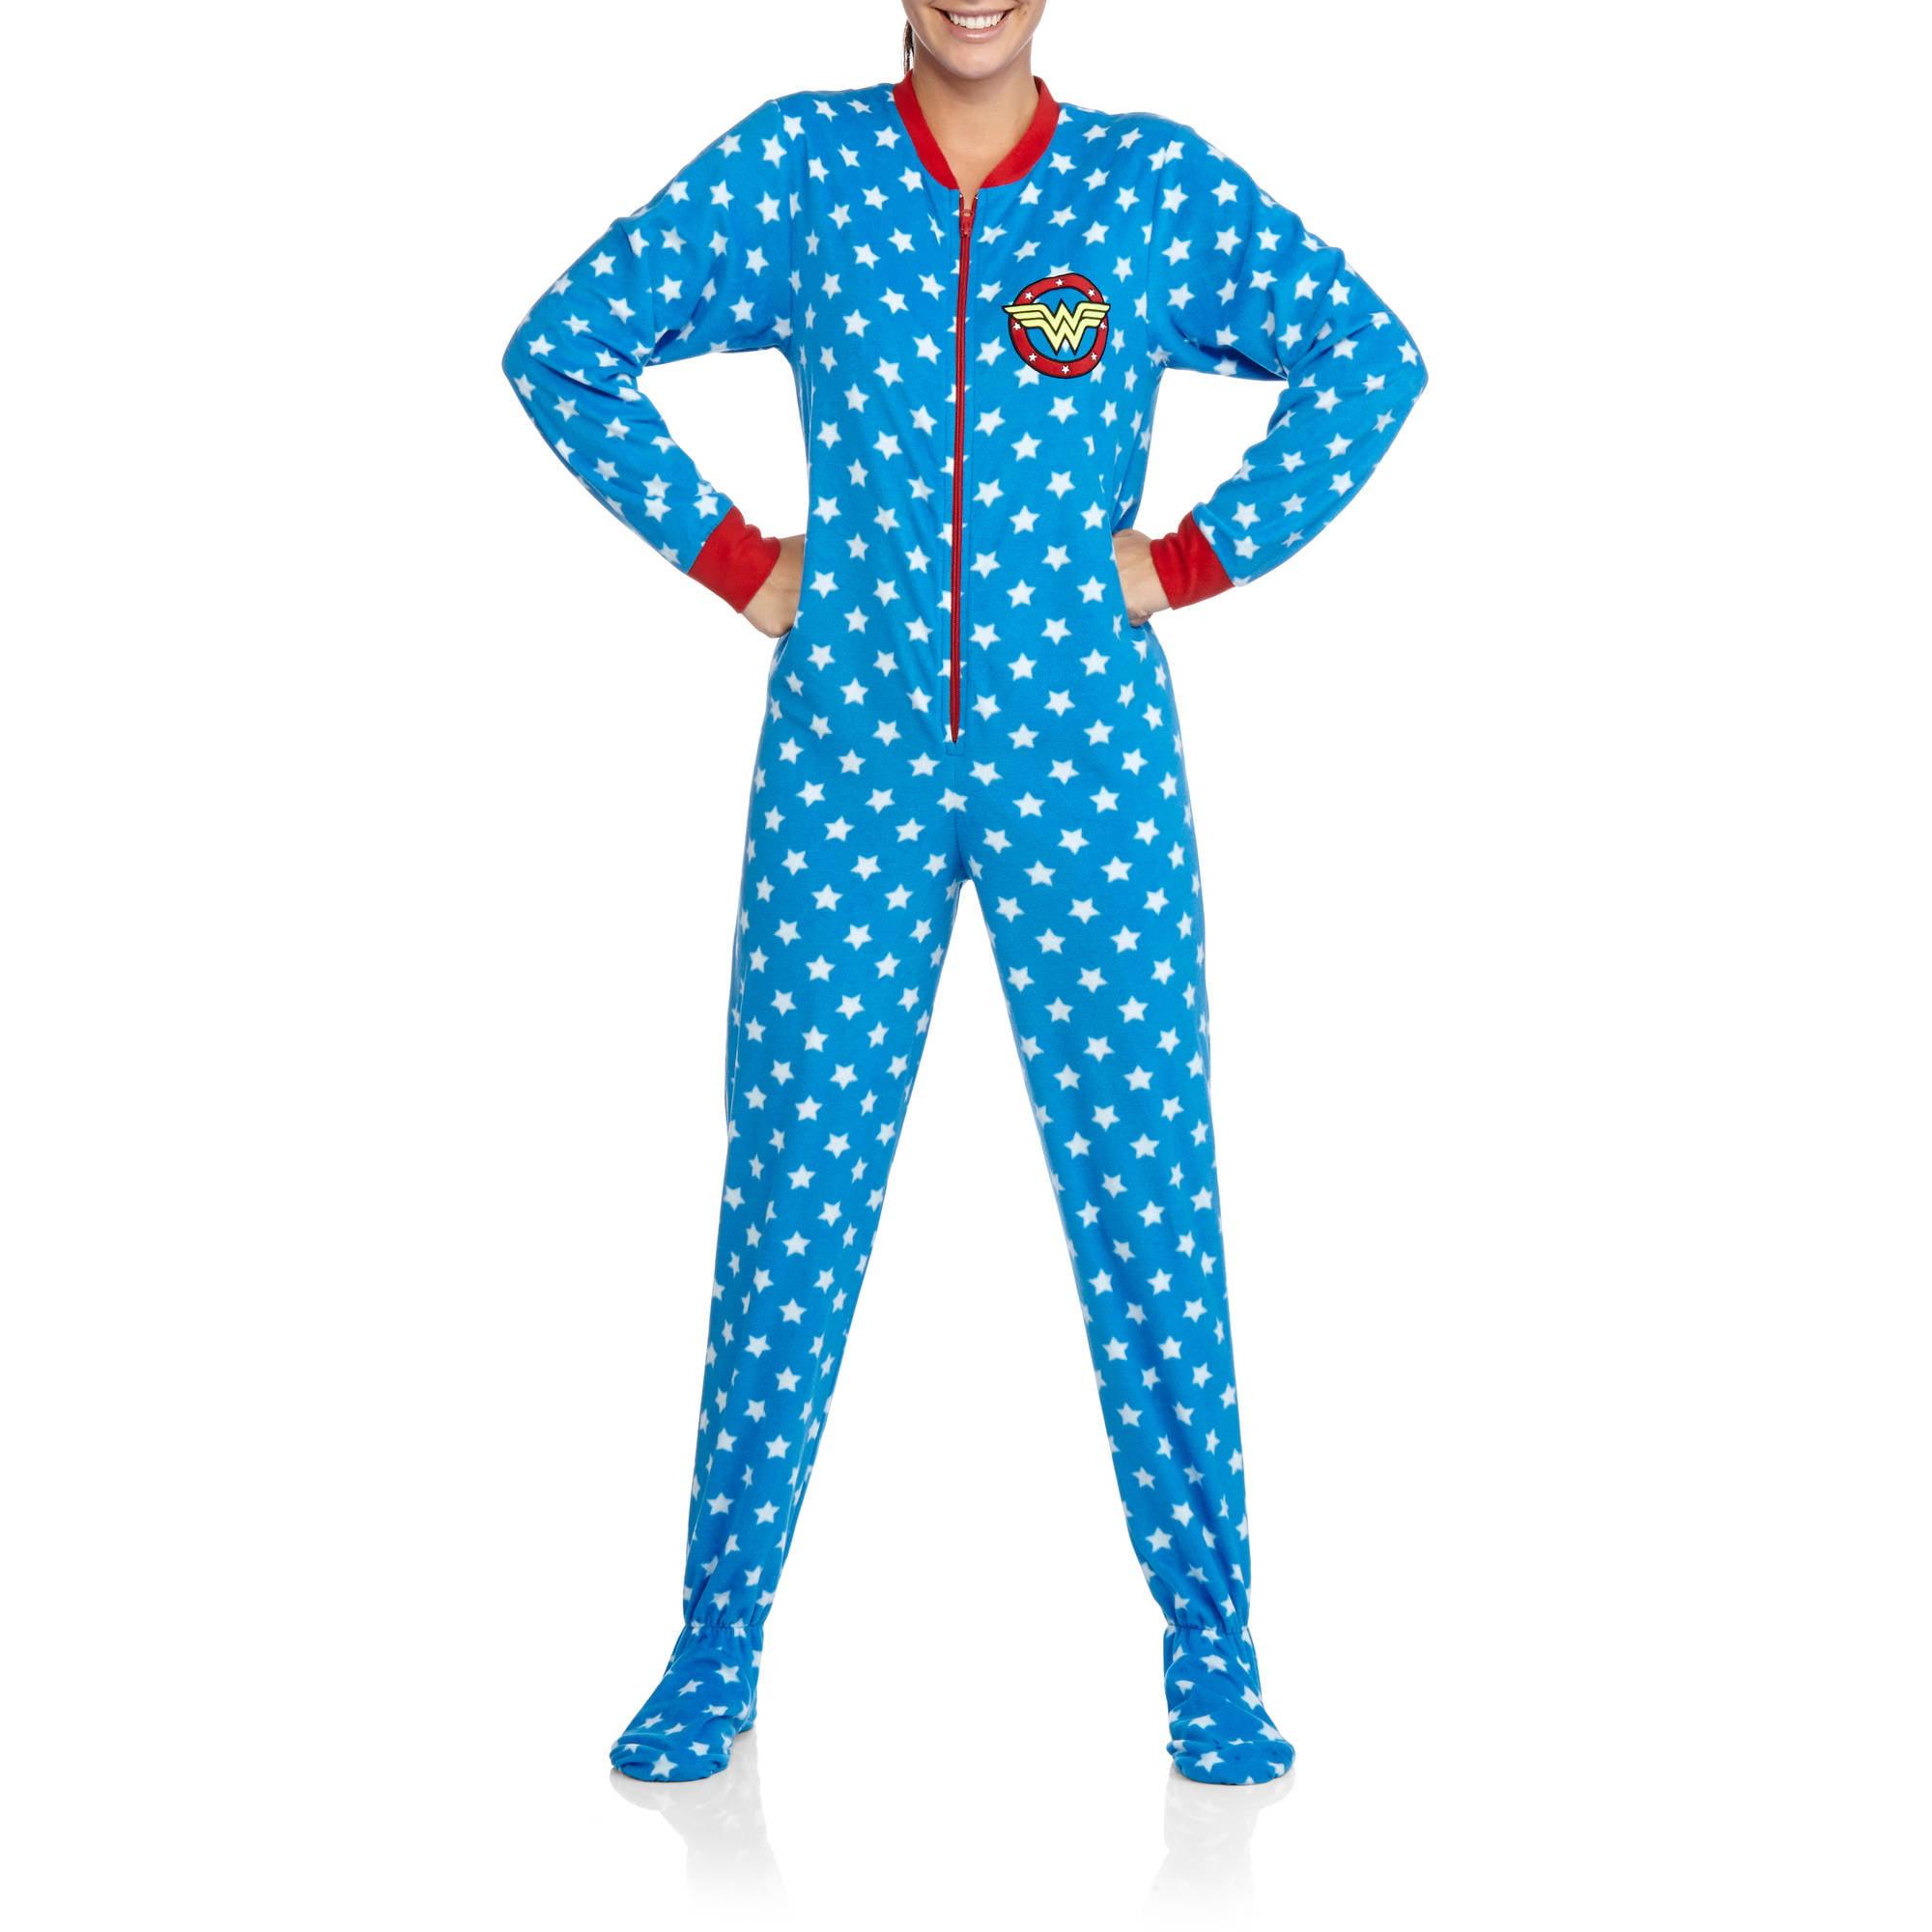 aa7c0c8312 Wonder Woman - Wonder Woman Sleepwear - Walmart.com